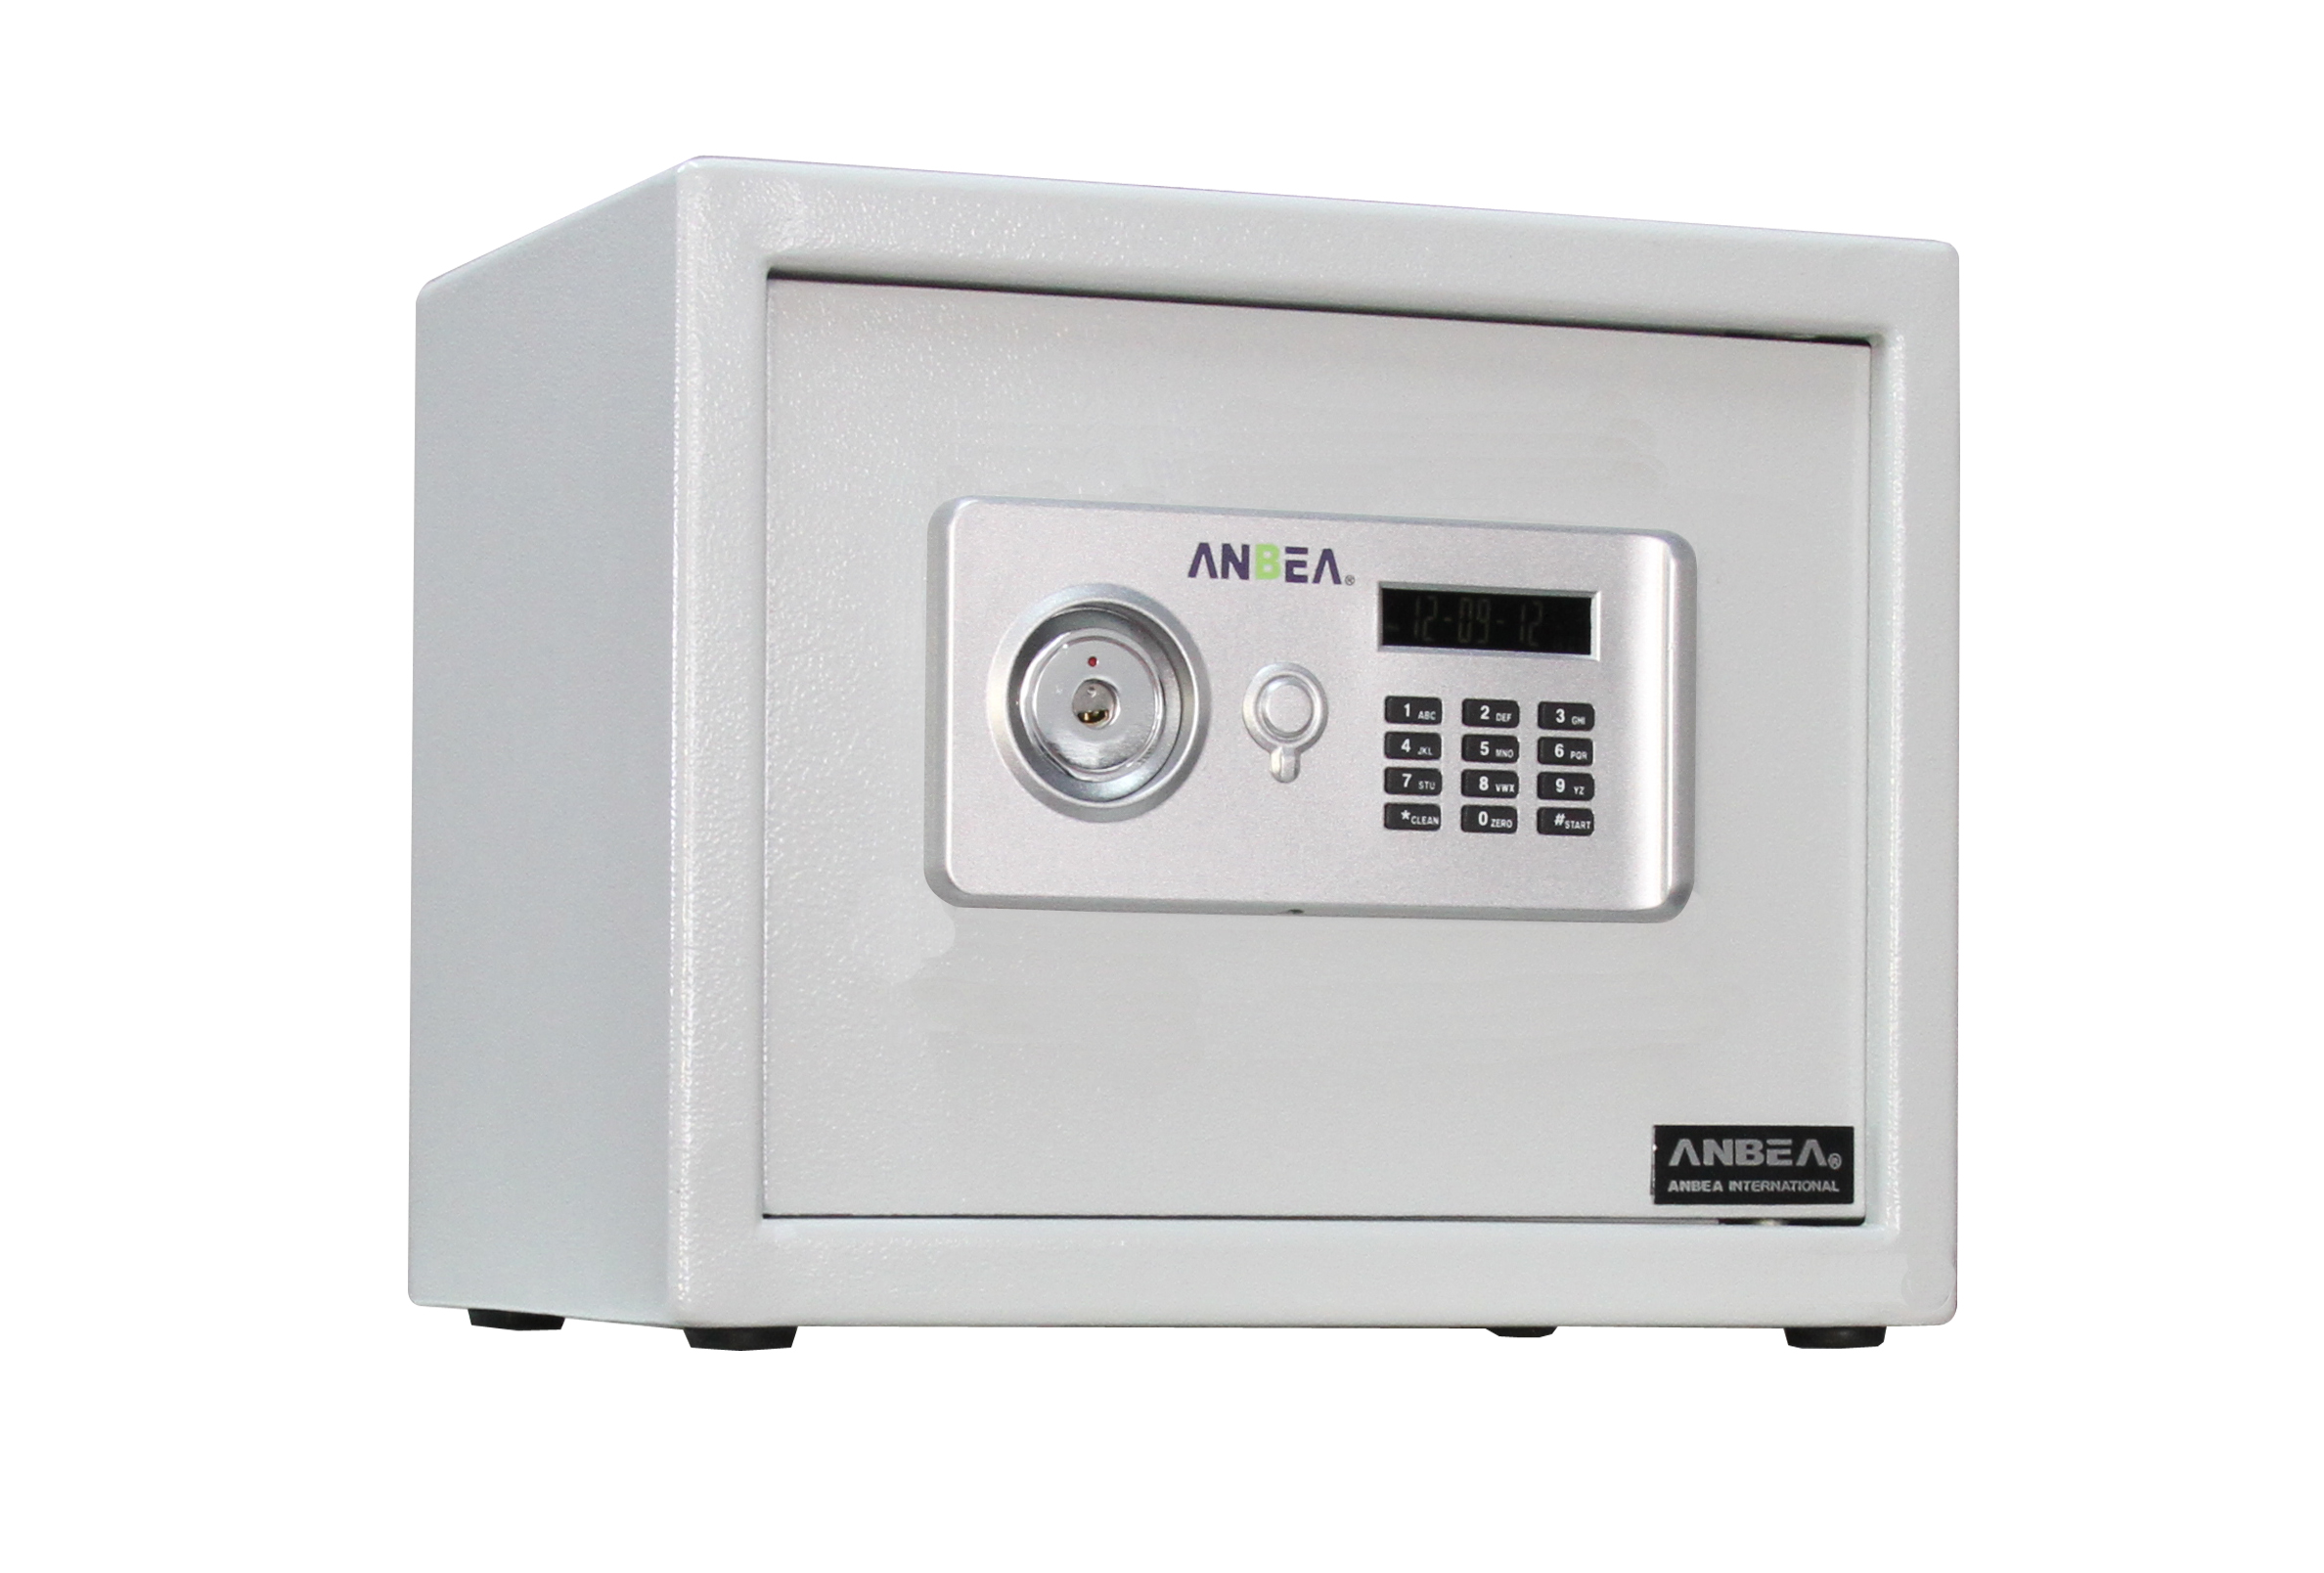 BB-30 防盗电子锁保险箱